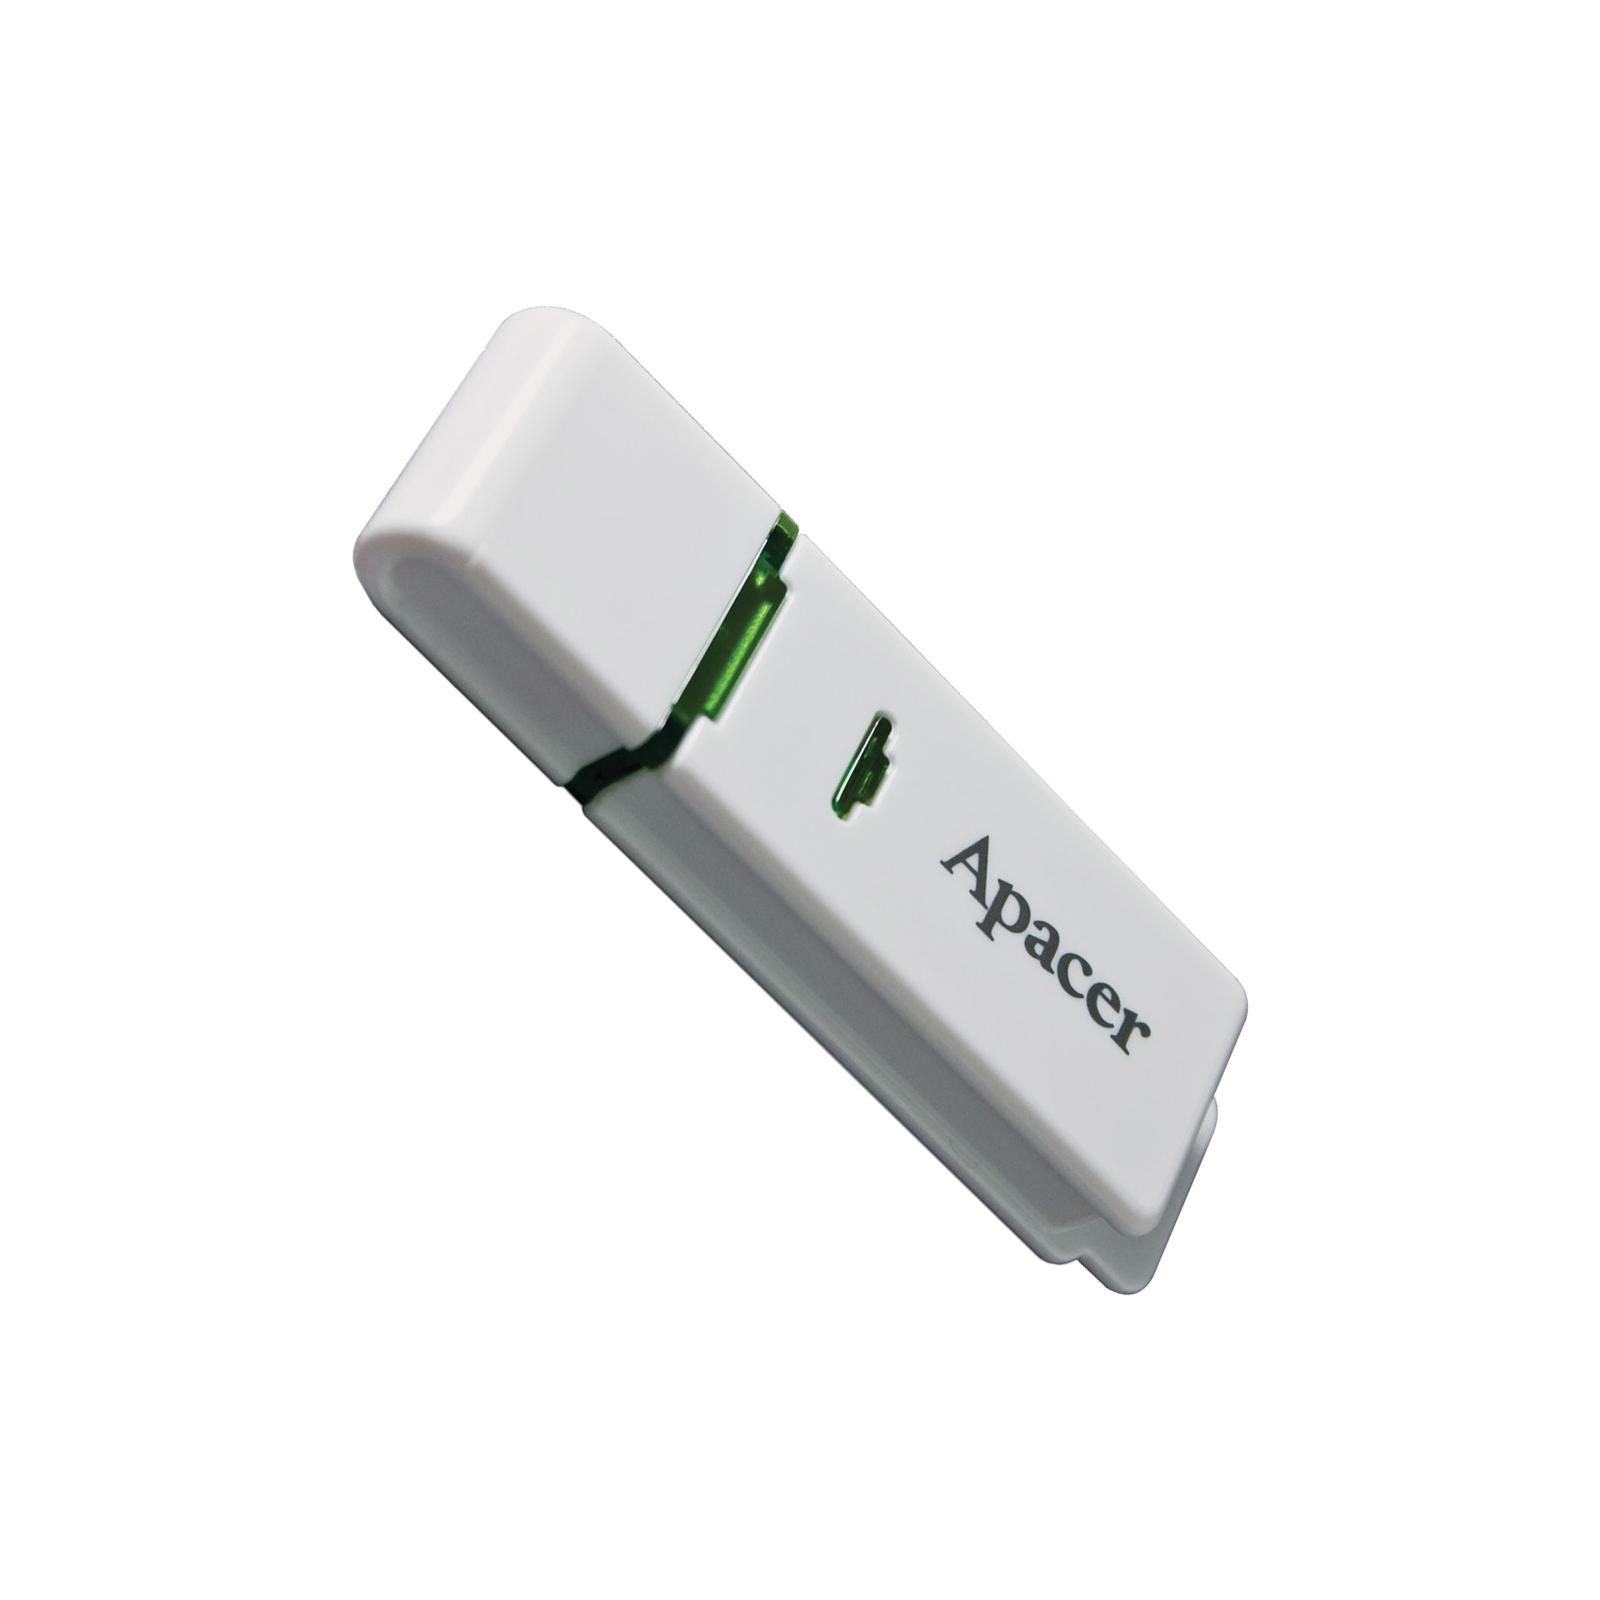 USB флеш накопитель Handy Steno AH223 white Apacer (AP8GAH223W-1) изображение 3